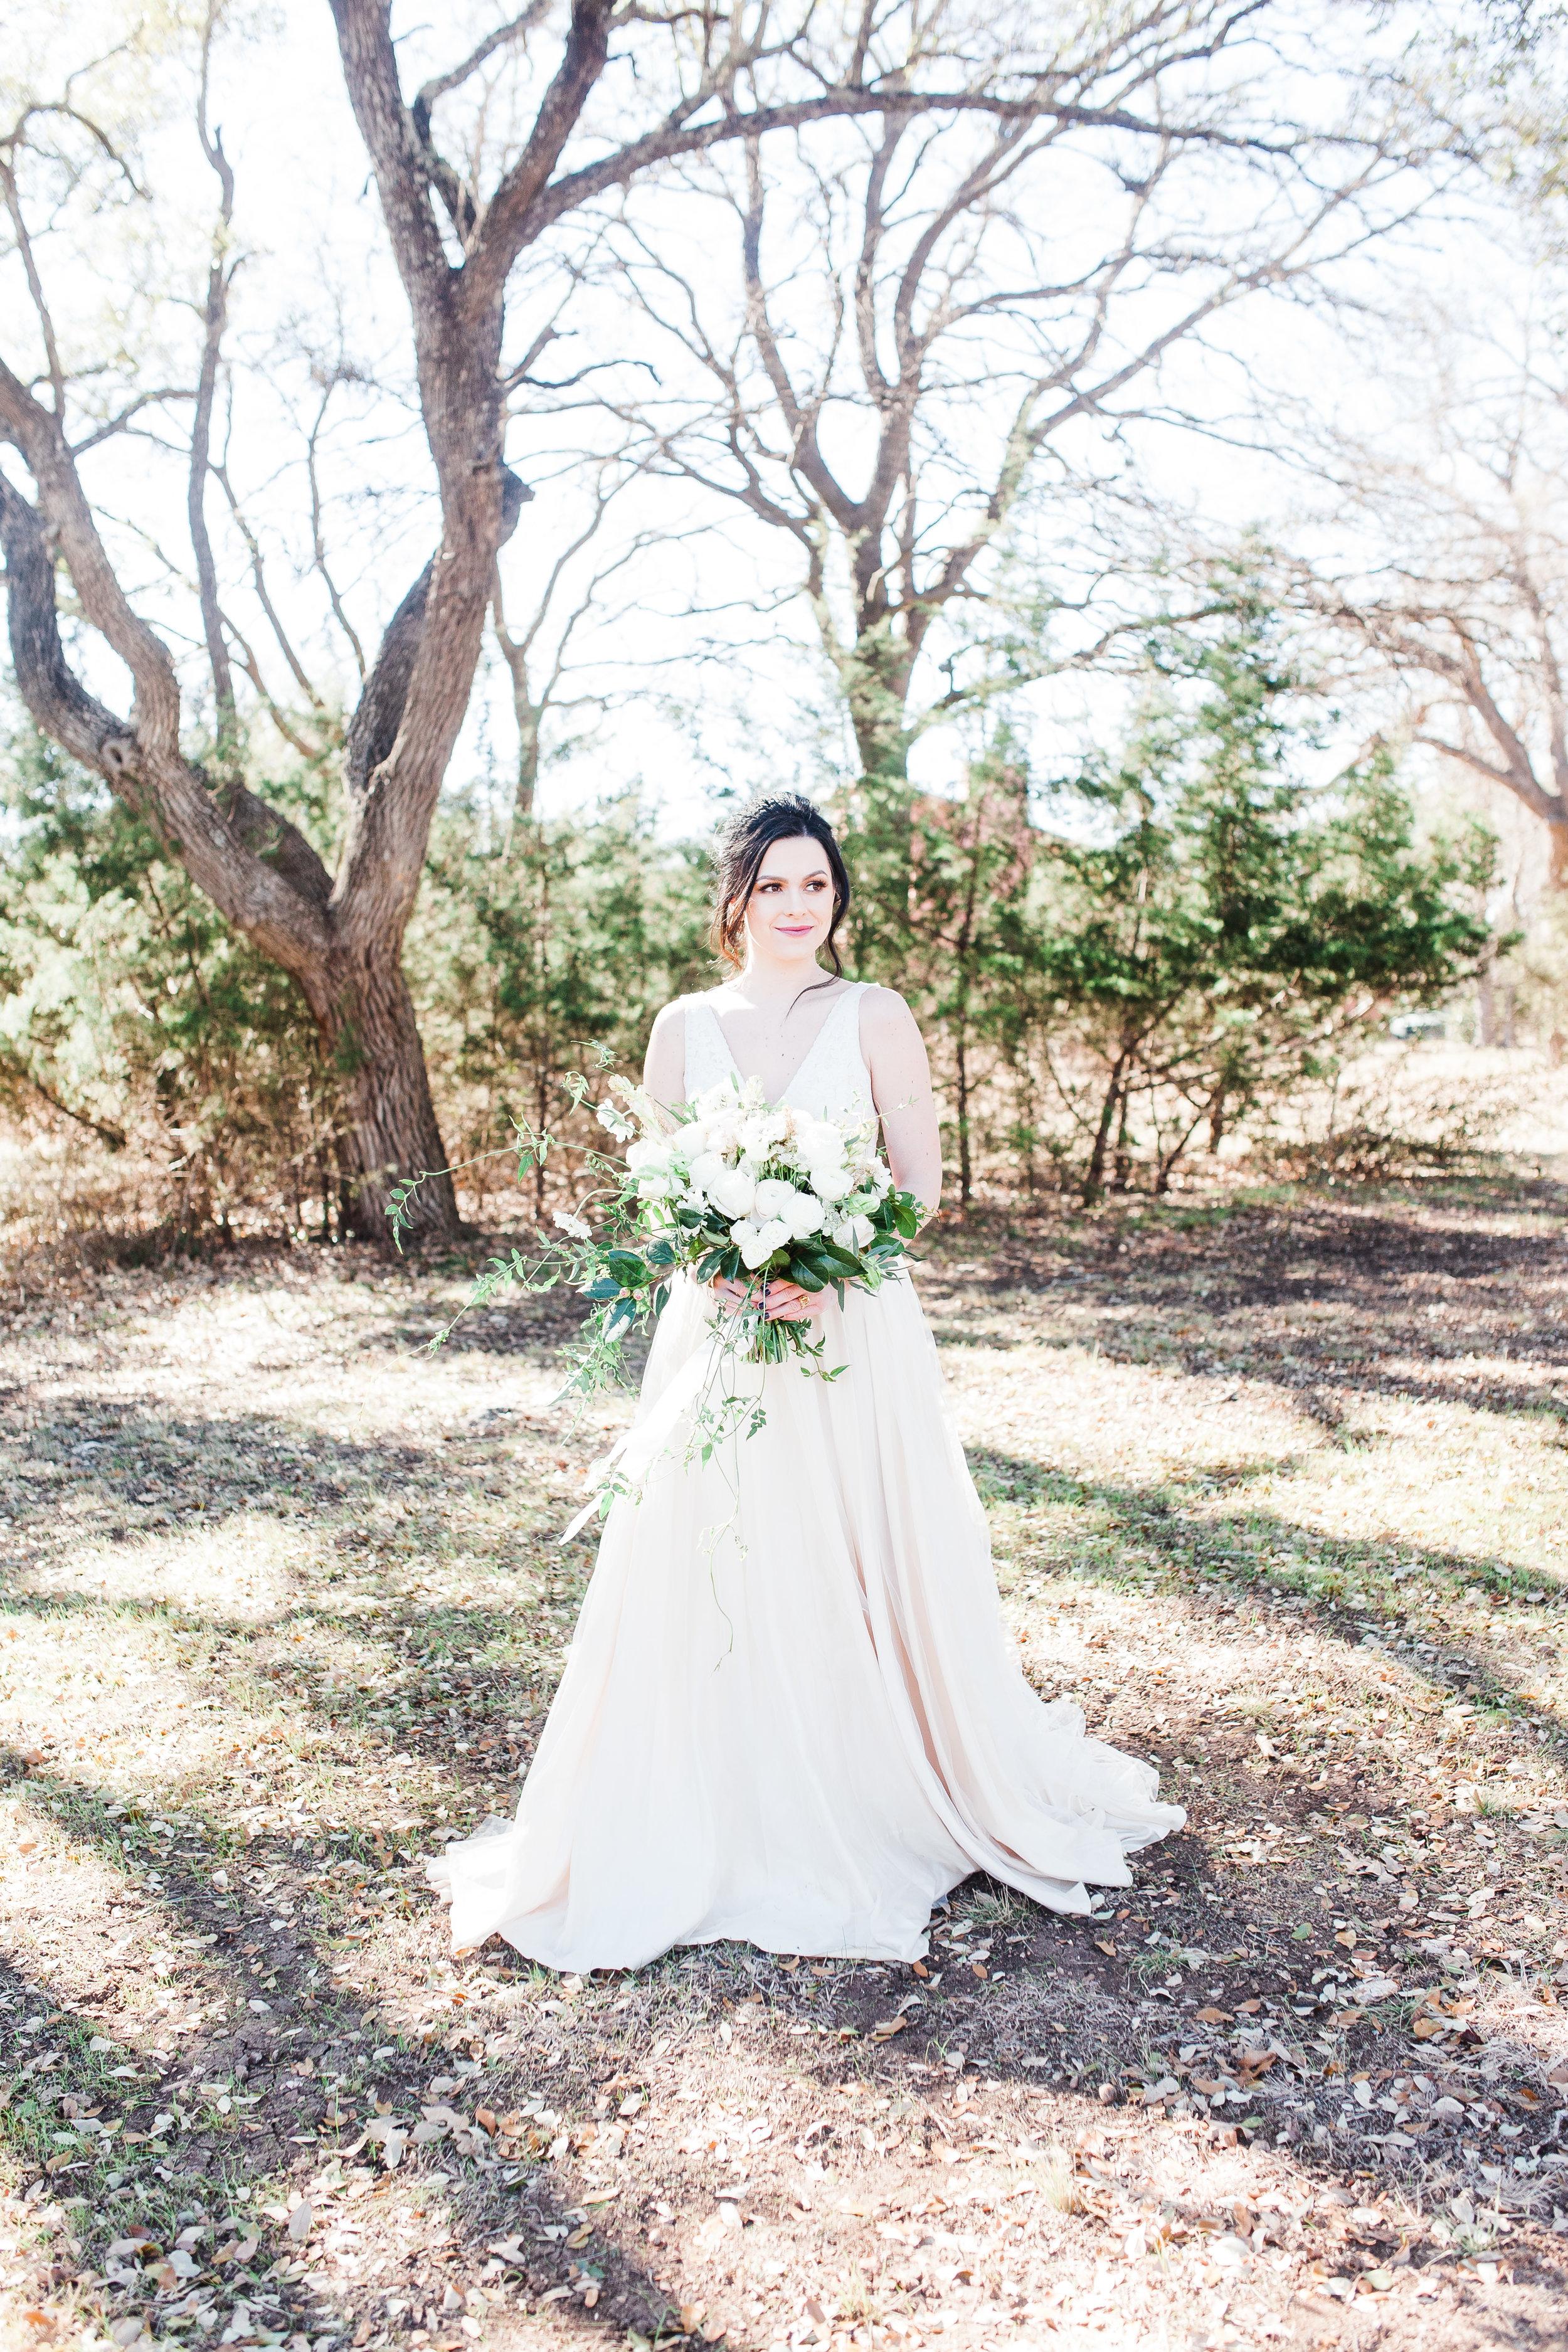 kindred oaks styled shoot austin texas wedding photographer-16.jpg